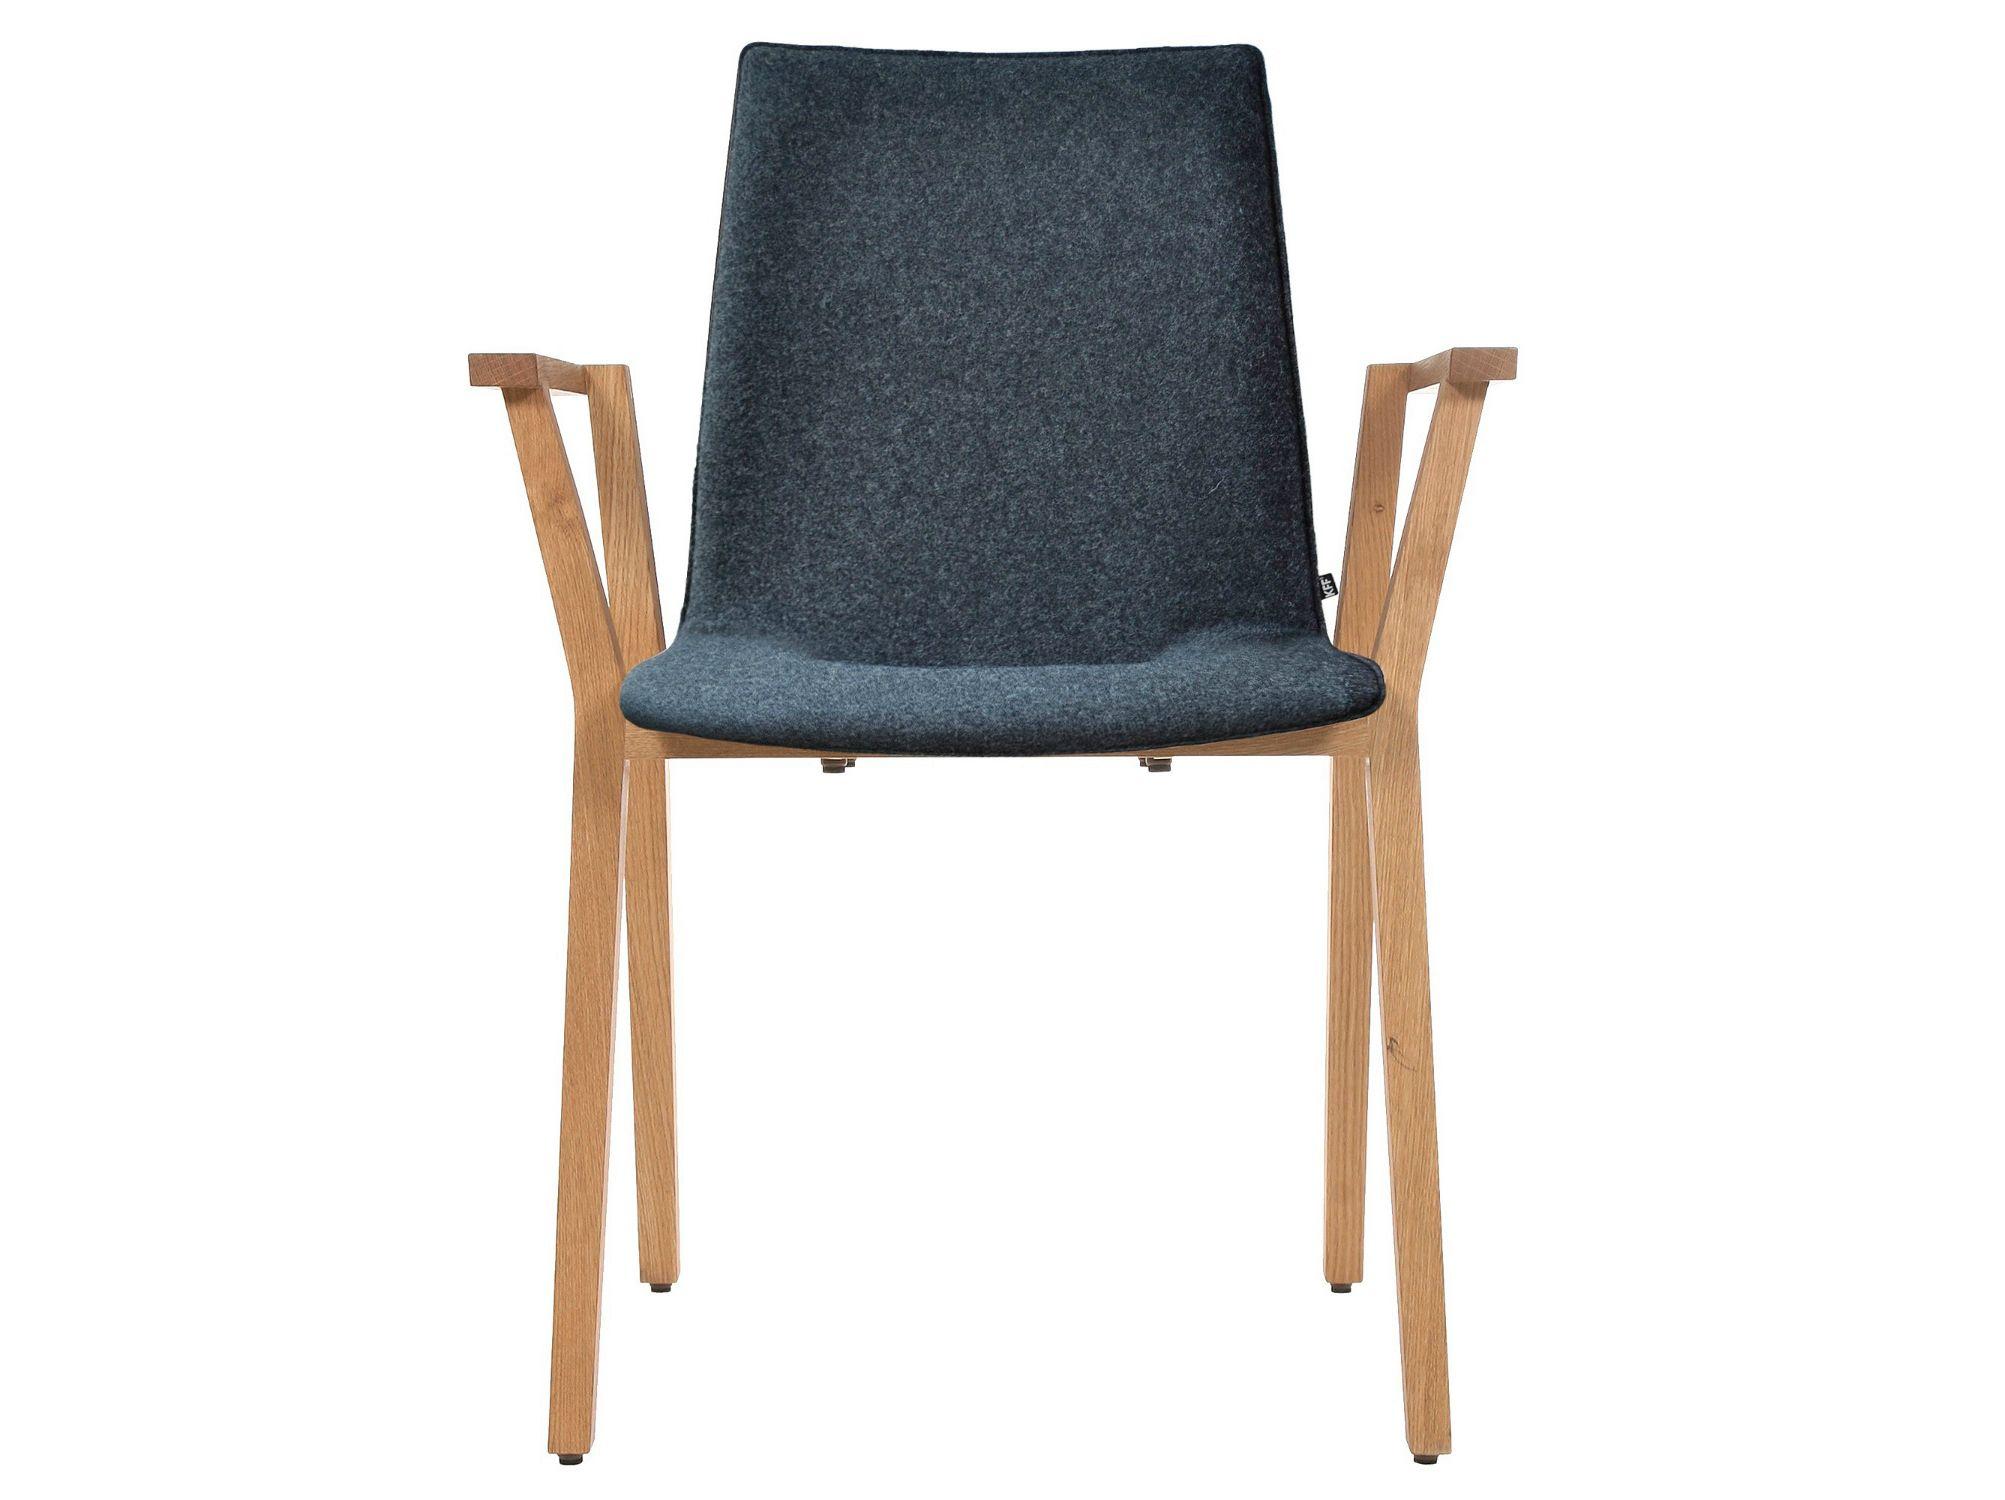 alec chaise avec accoudoirs by kff design detlef fischer. Black Bedroom Furniture Sets. Home Design Ideas